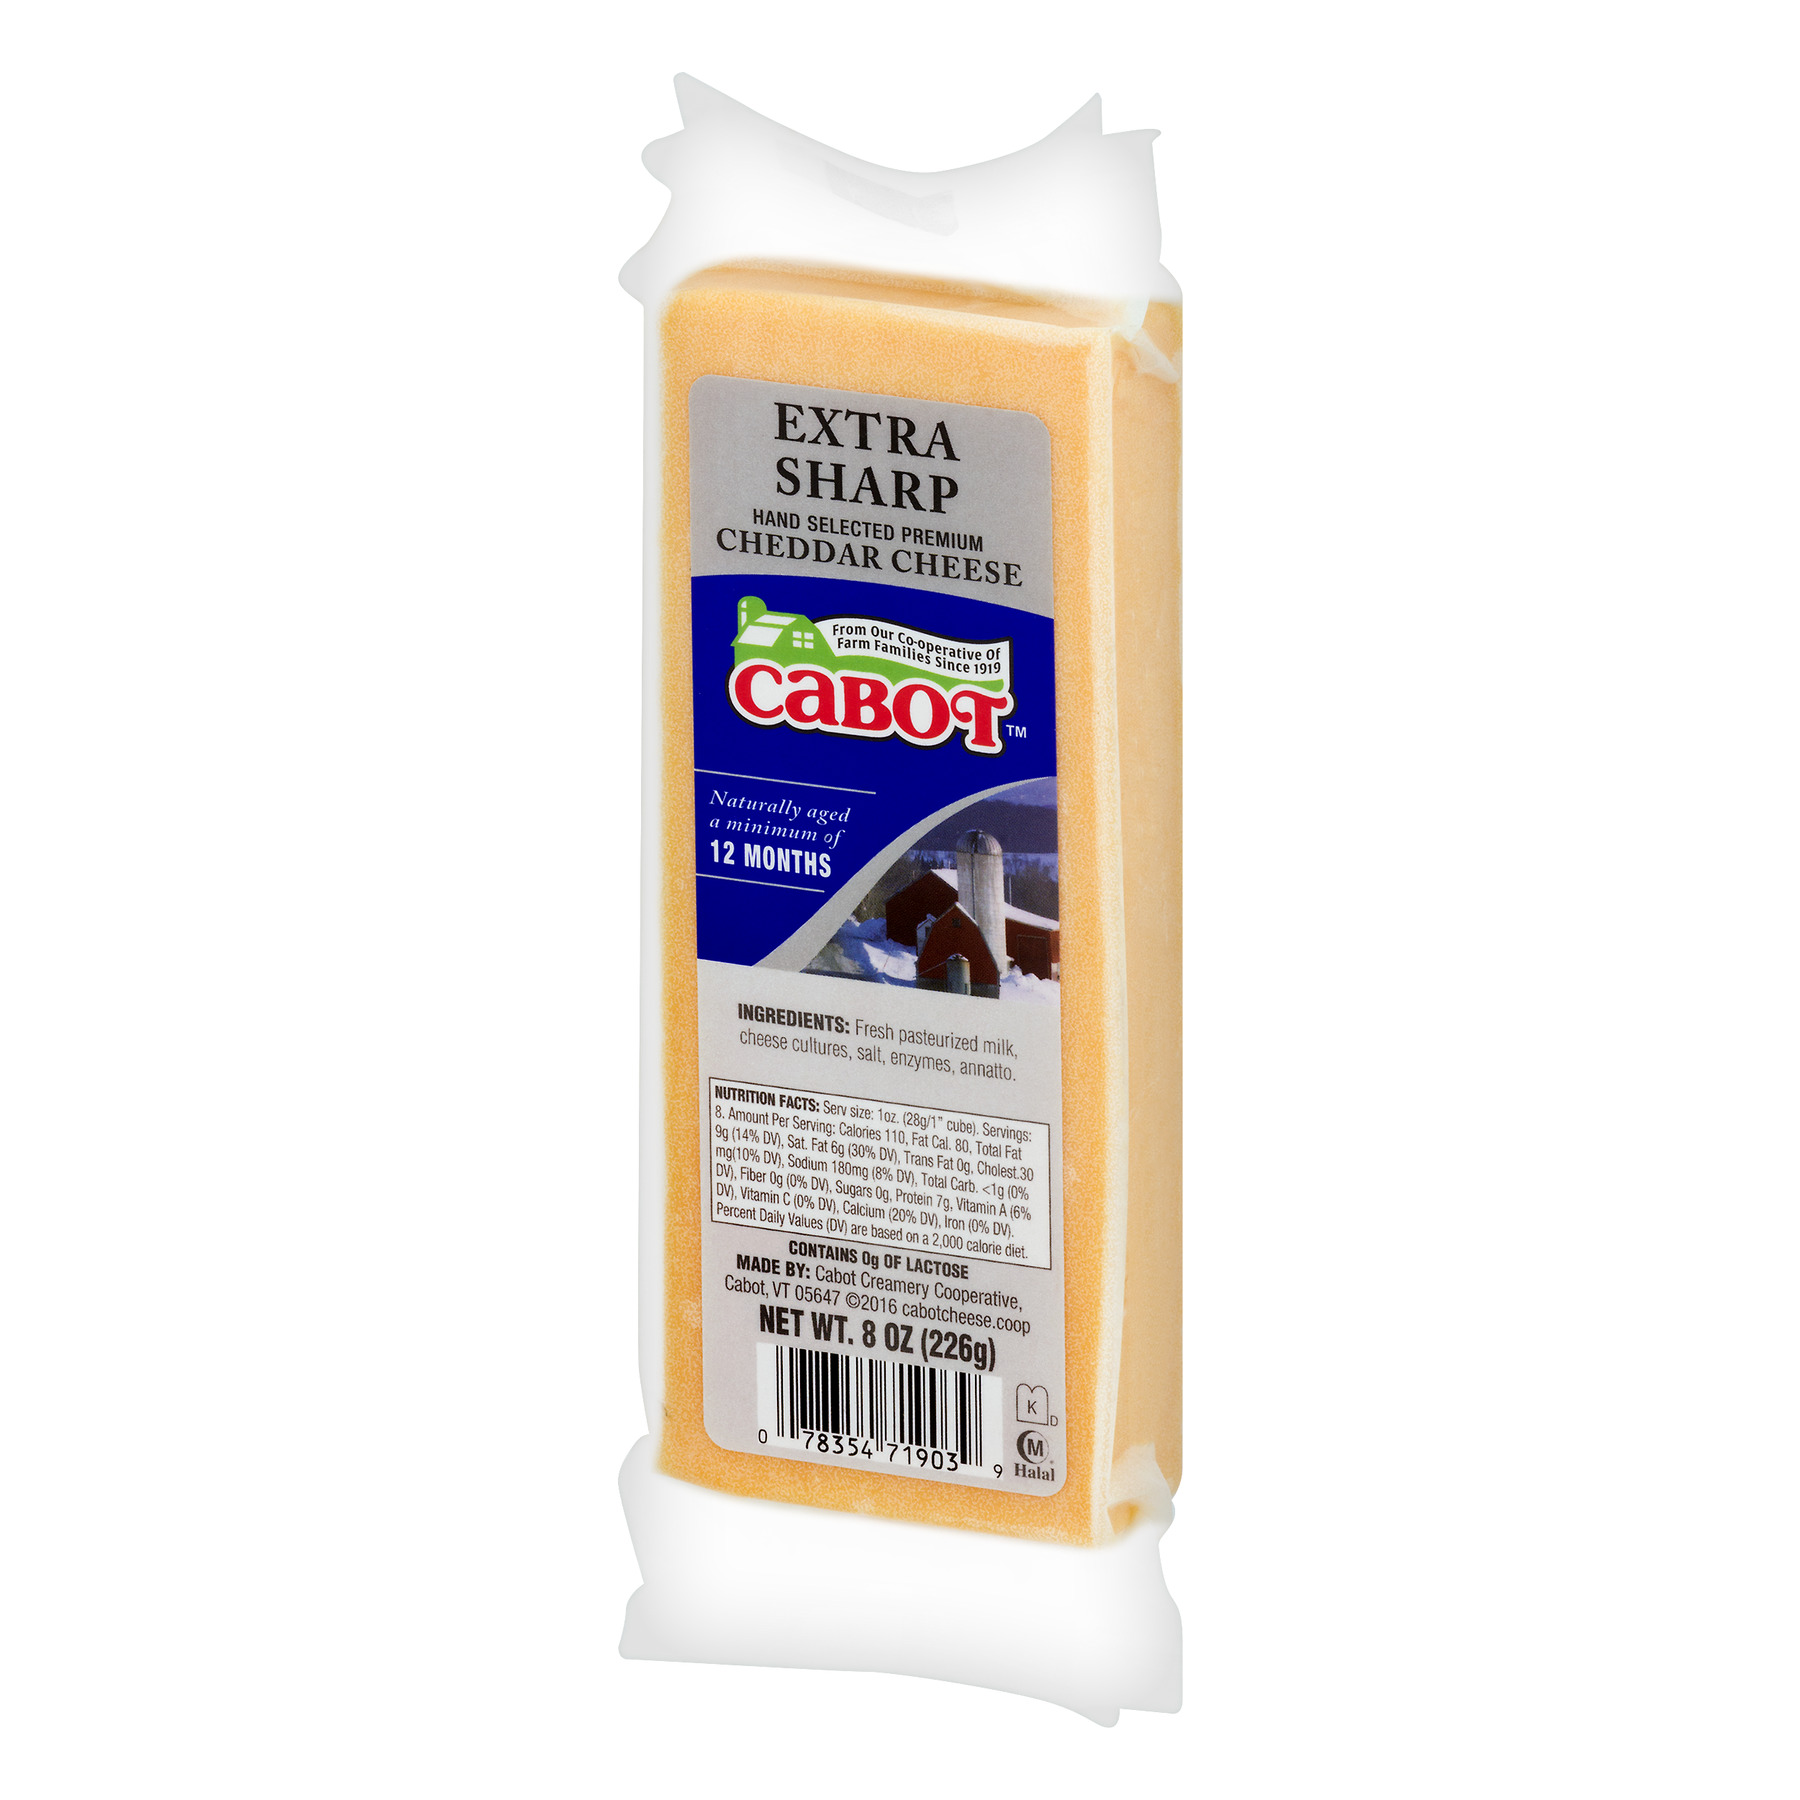 Cabot Cheddar Cheese Extra Sharp, 8 oz - Walmart com